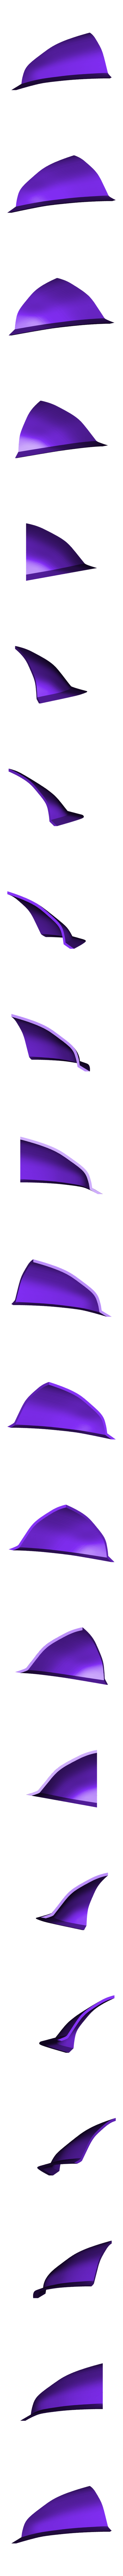 Part 3 v1.stl Download STL file ARF Trooper Helmet • 3D print object, VillainousPropShop